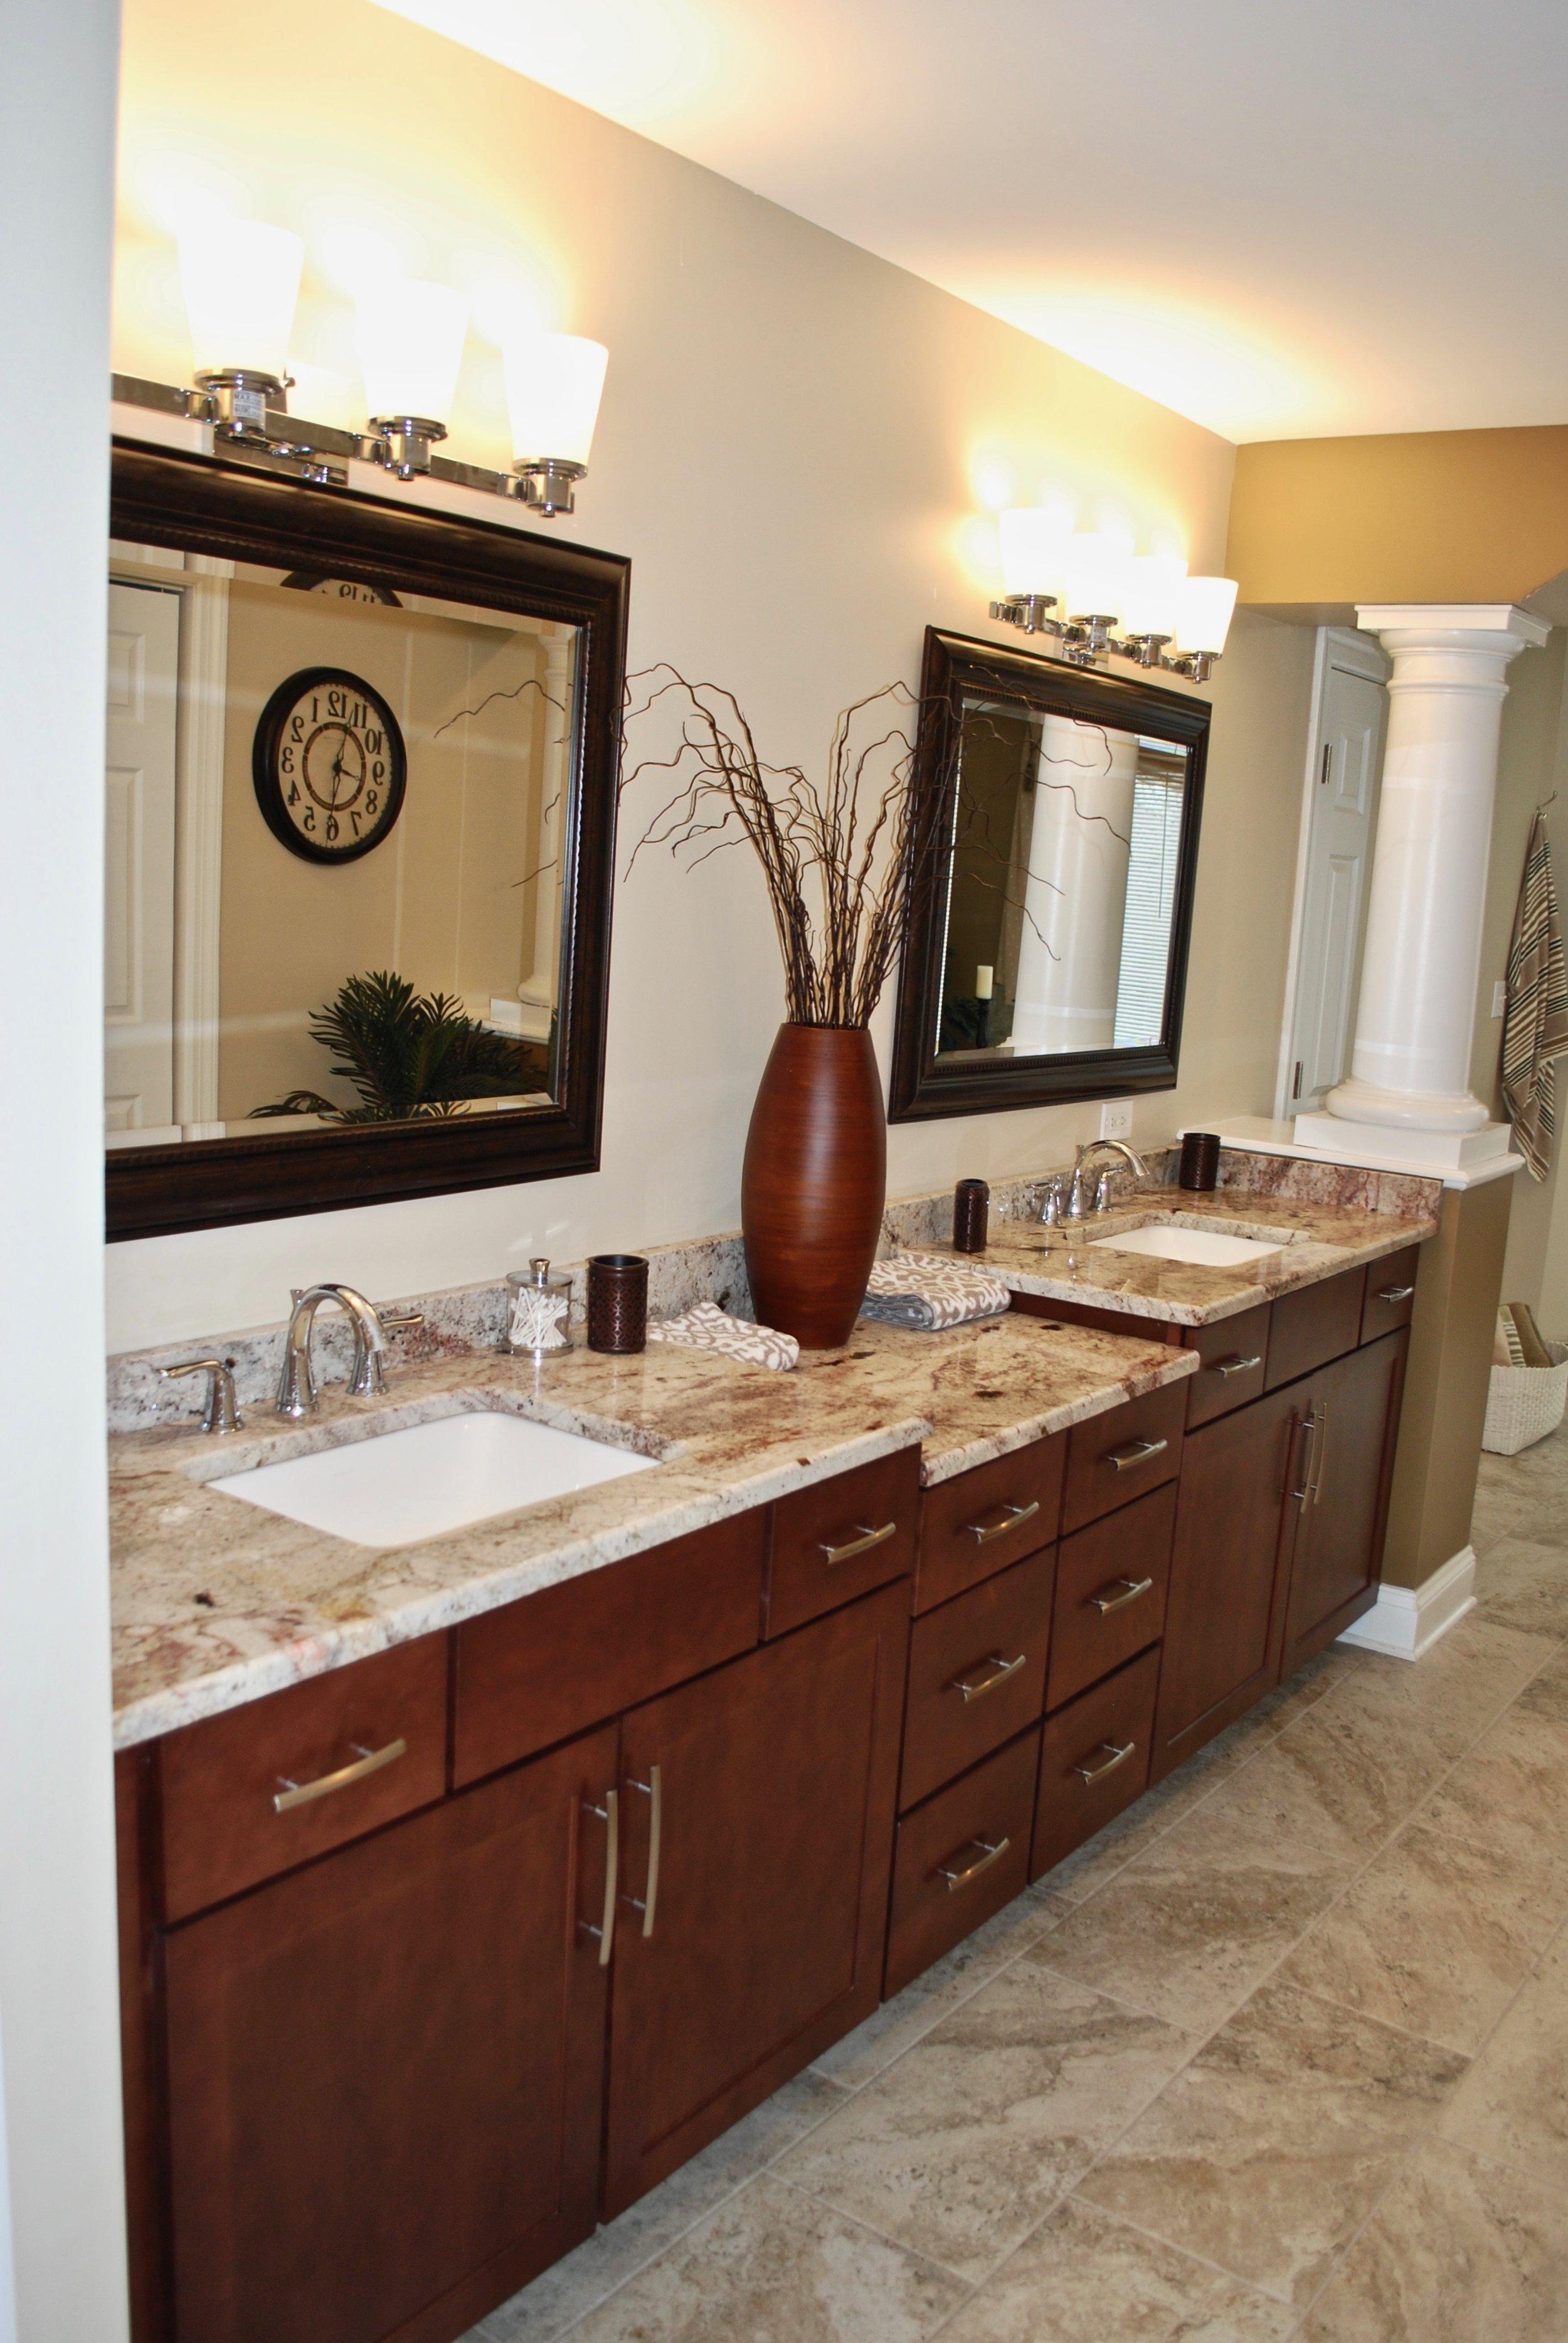 Bathroom Remodeling in Geneva IL. Painted Vanities & New Cabinets